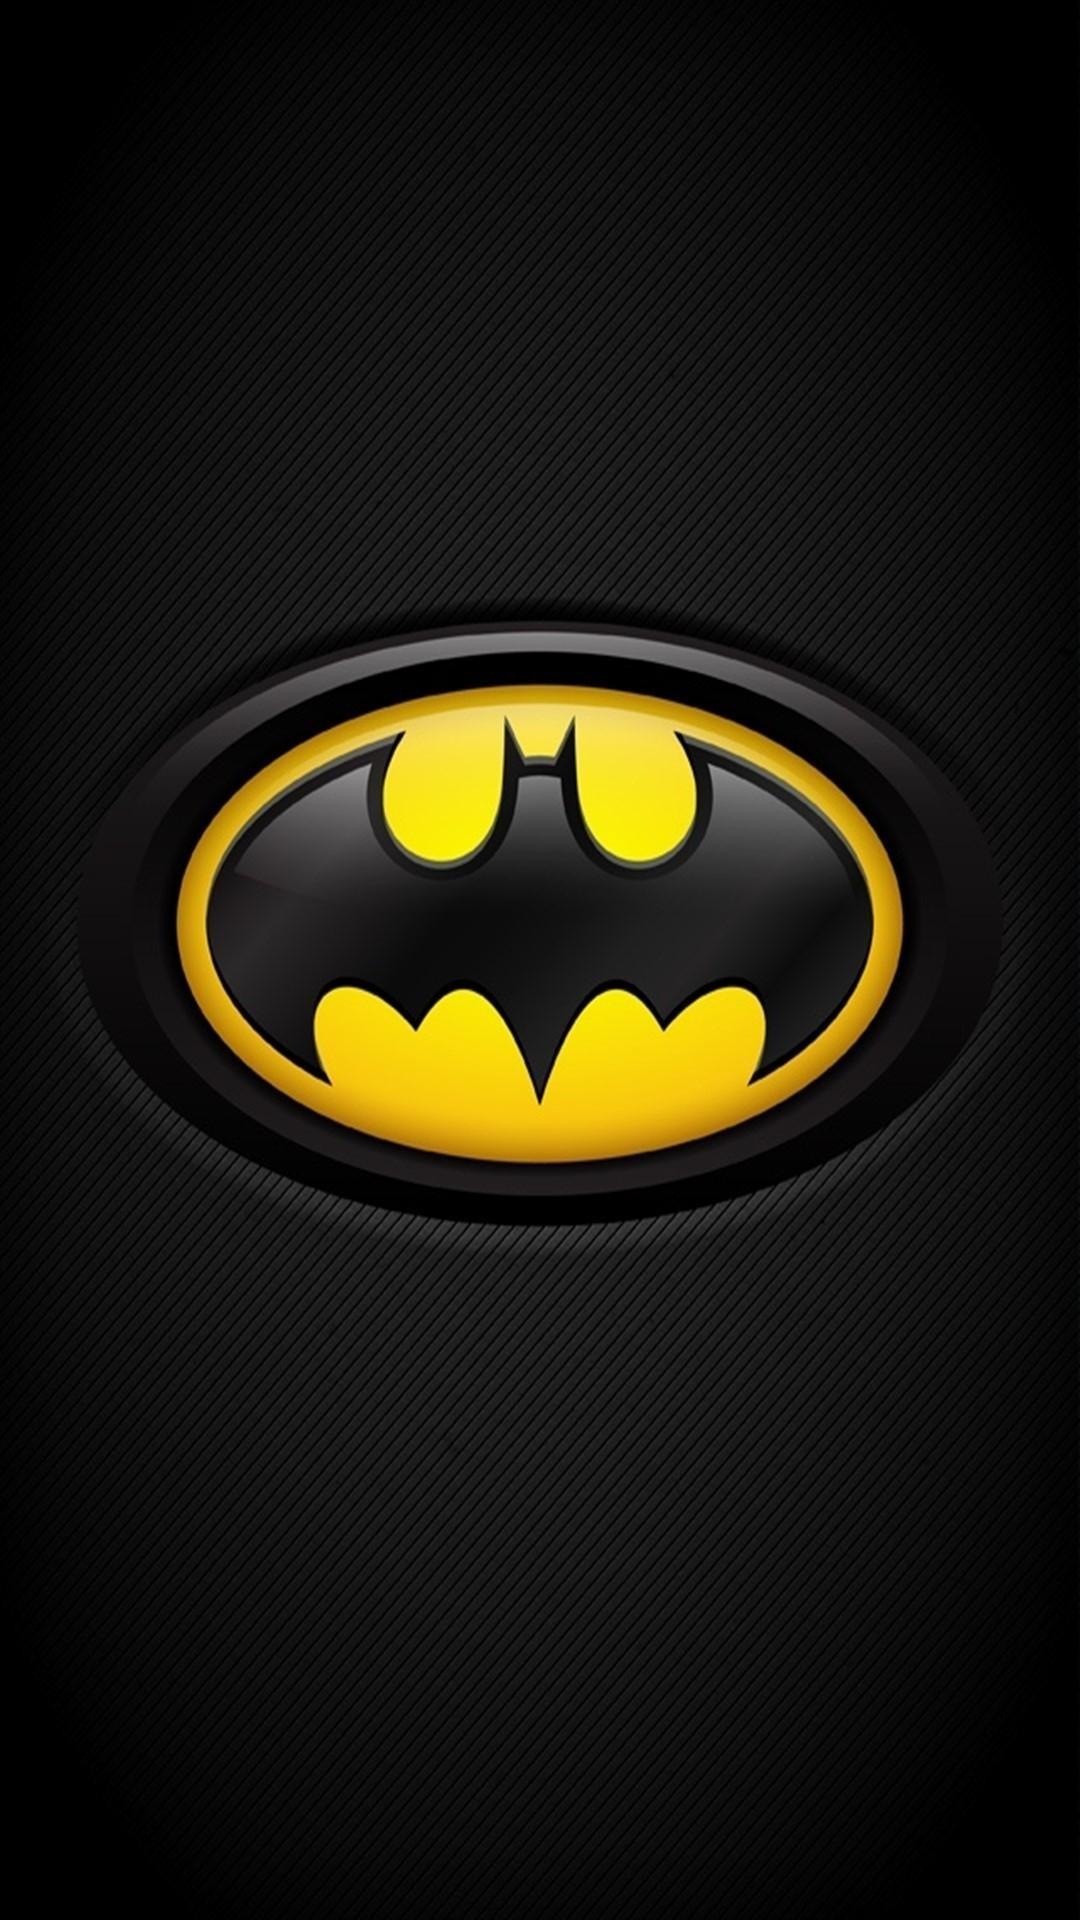 As-melhores-ideias-sobre-Batman-Iphone-no-Pinterest-